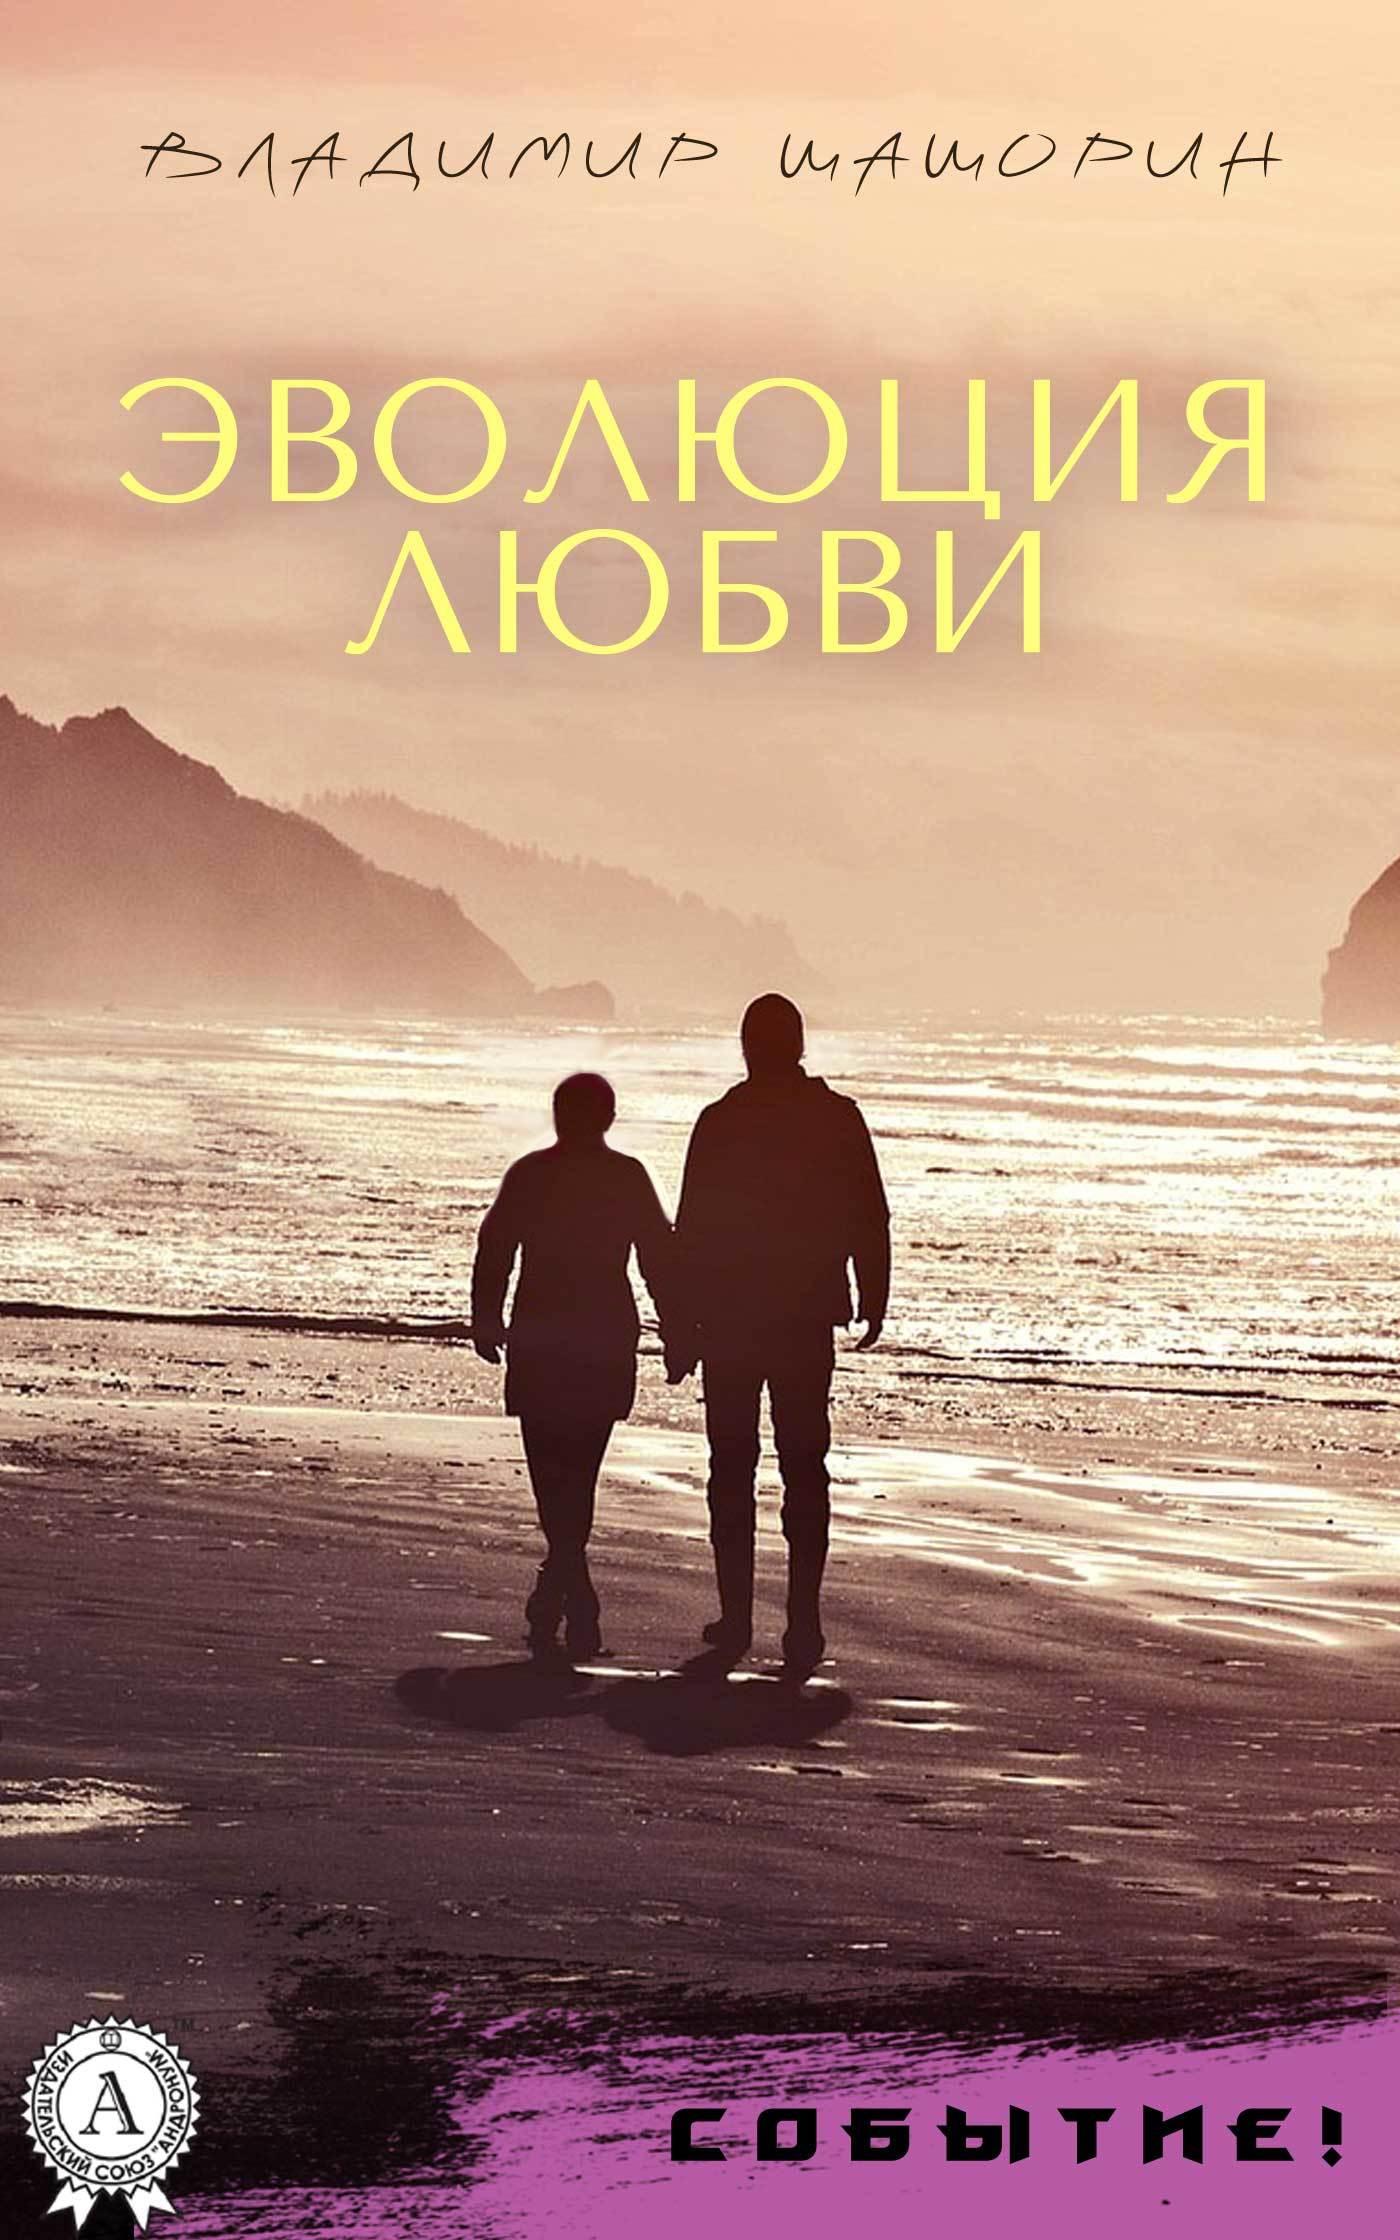 Владимир Шашорин - Эволюция любви